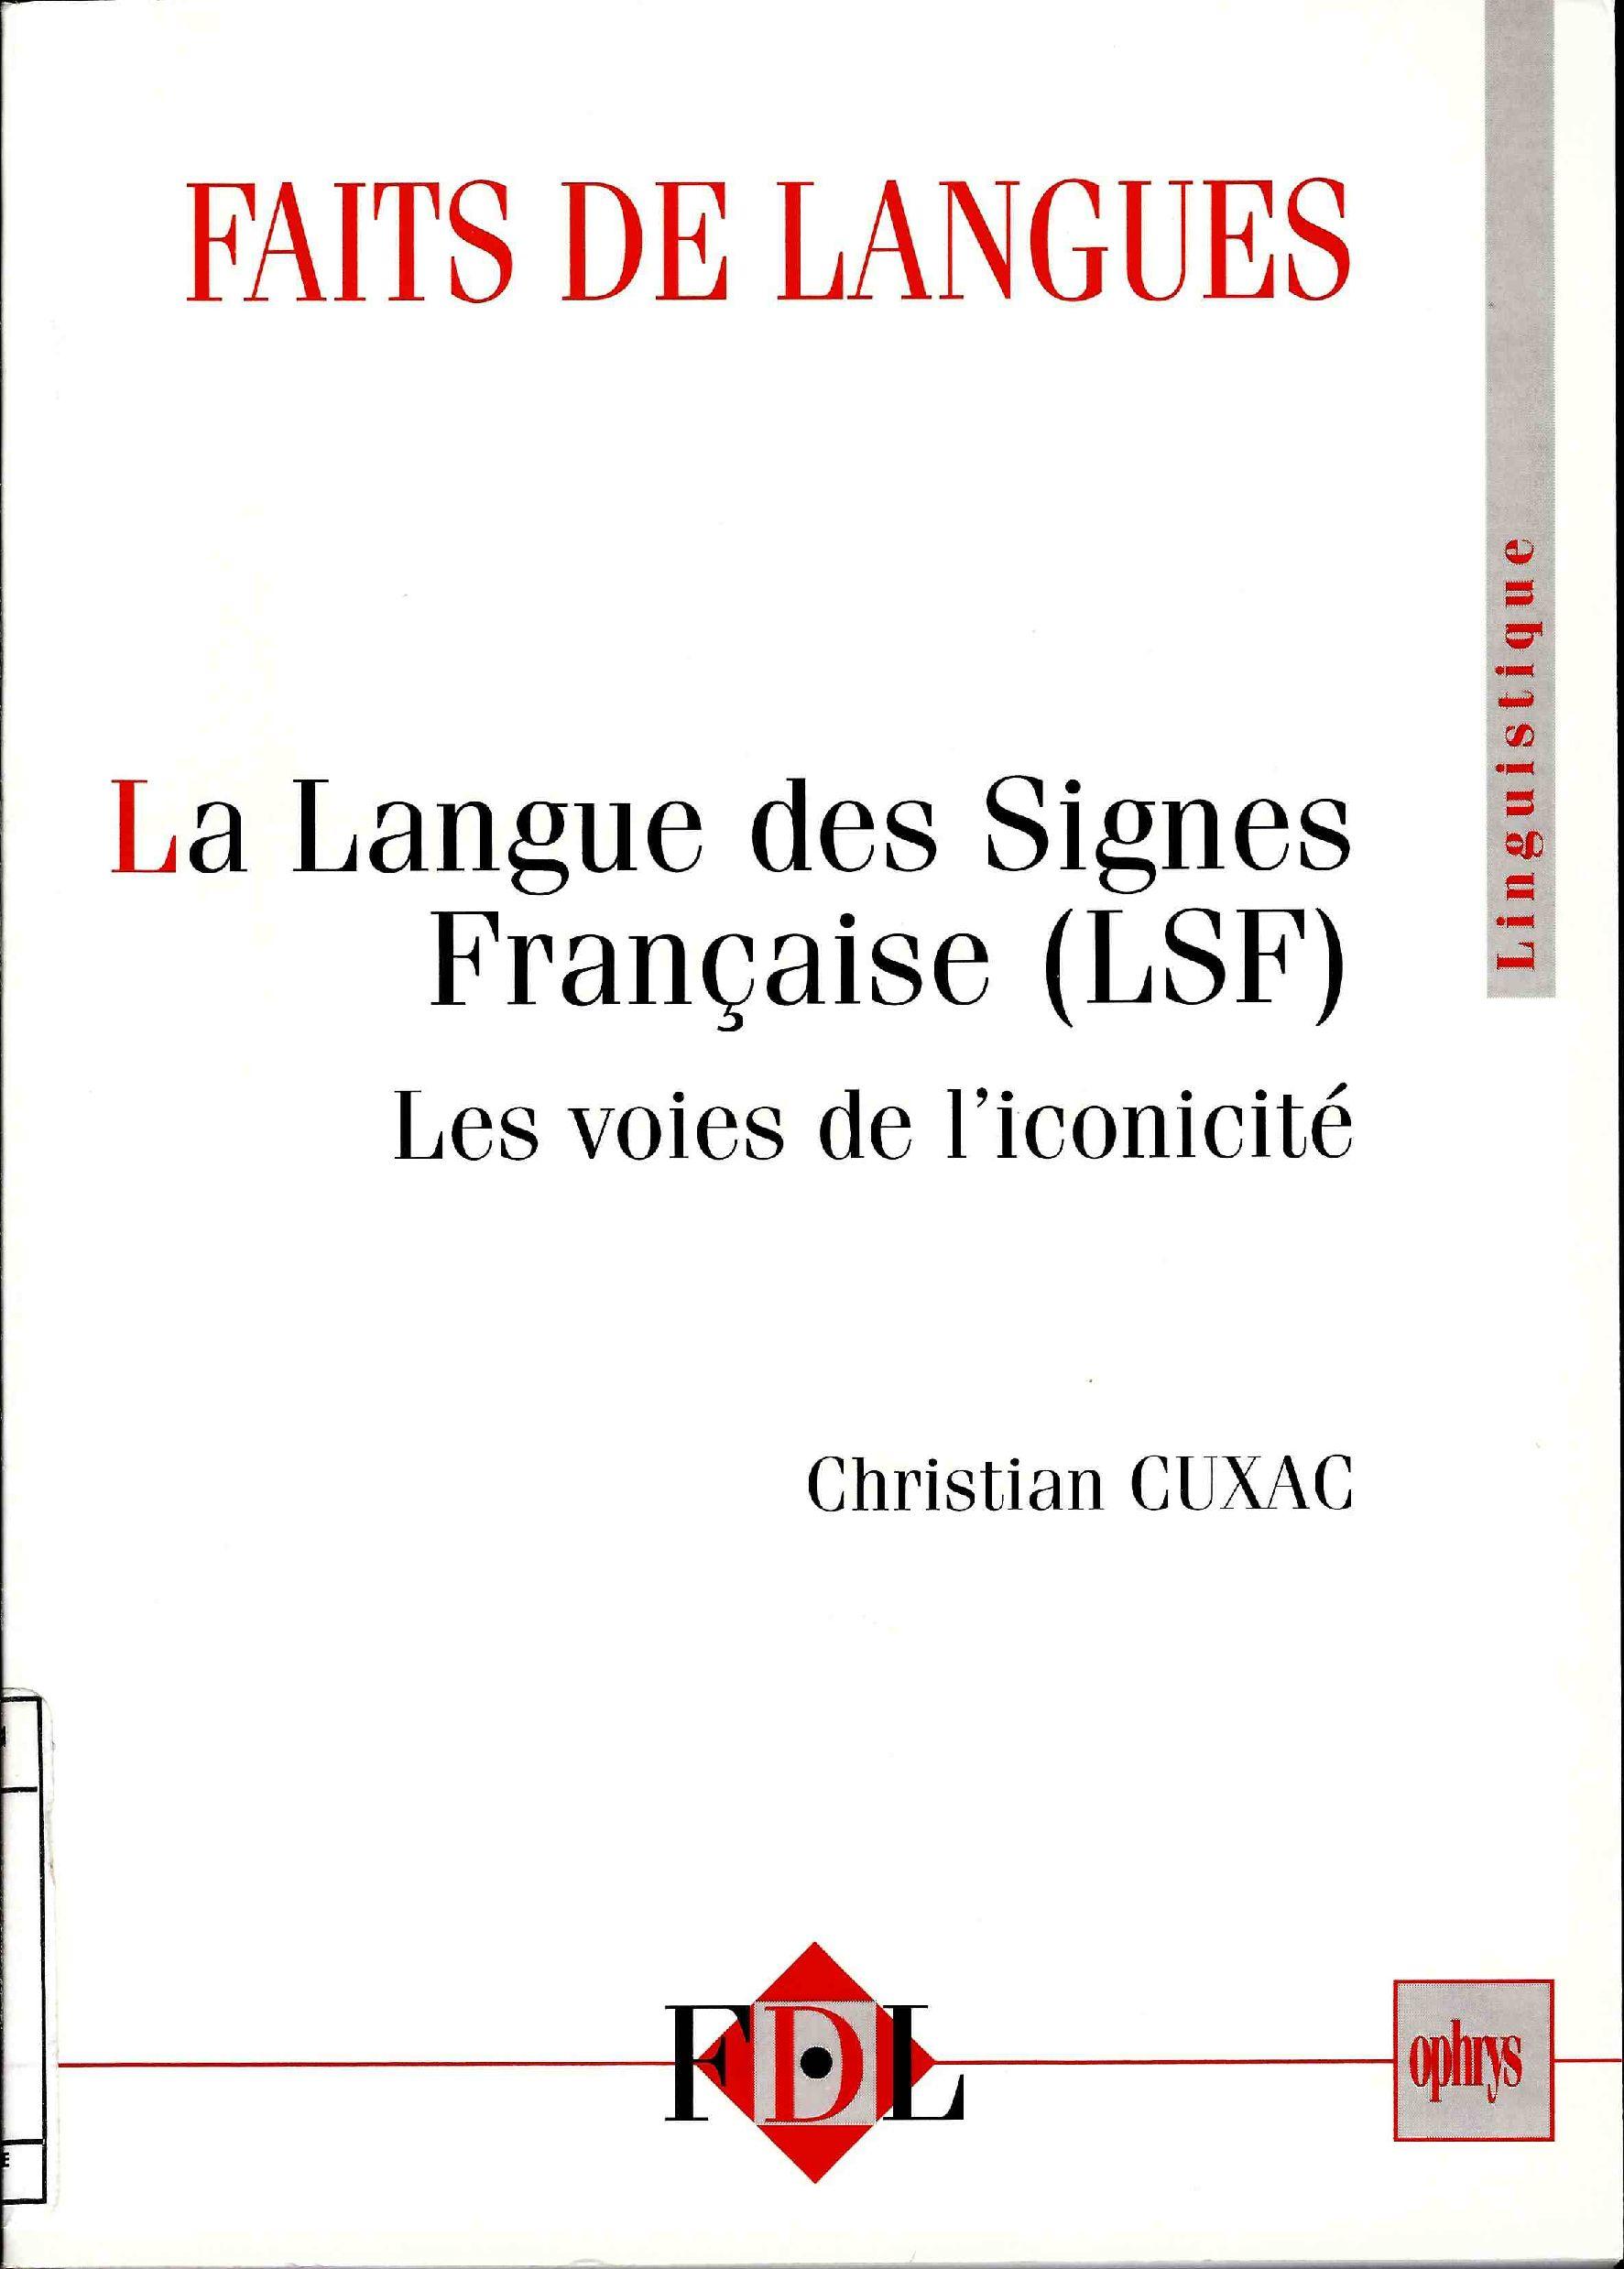 Faits de langues N° 15-16